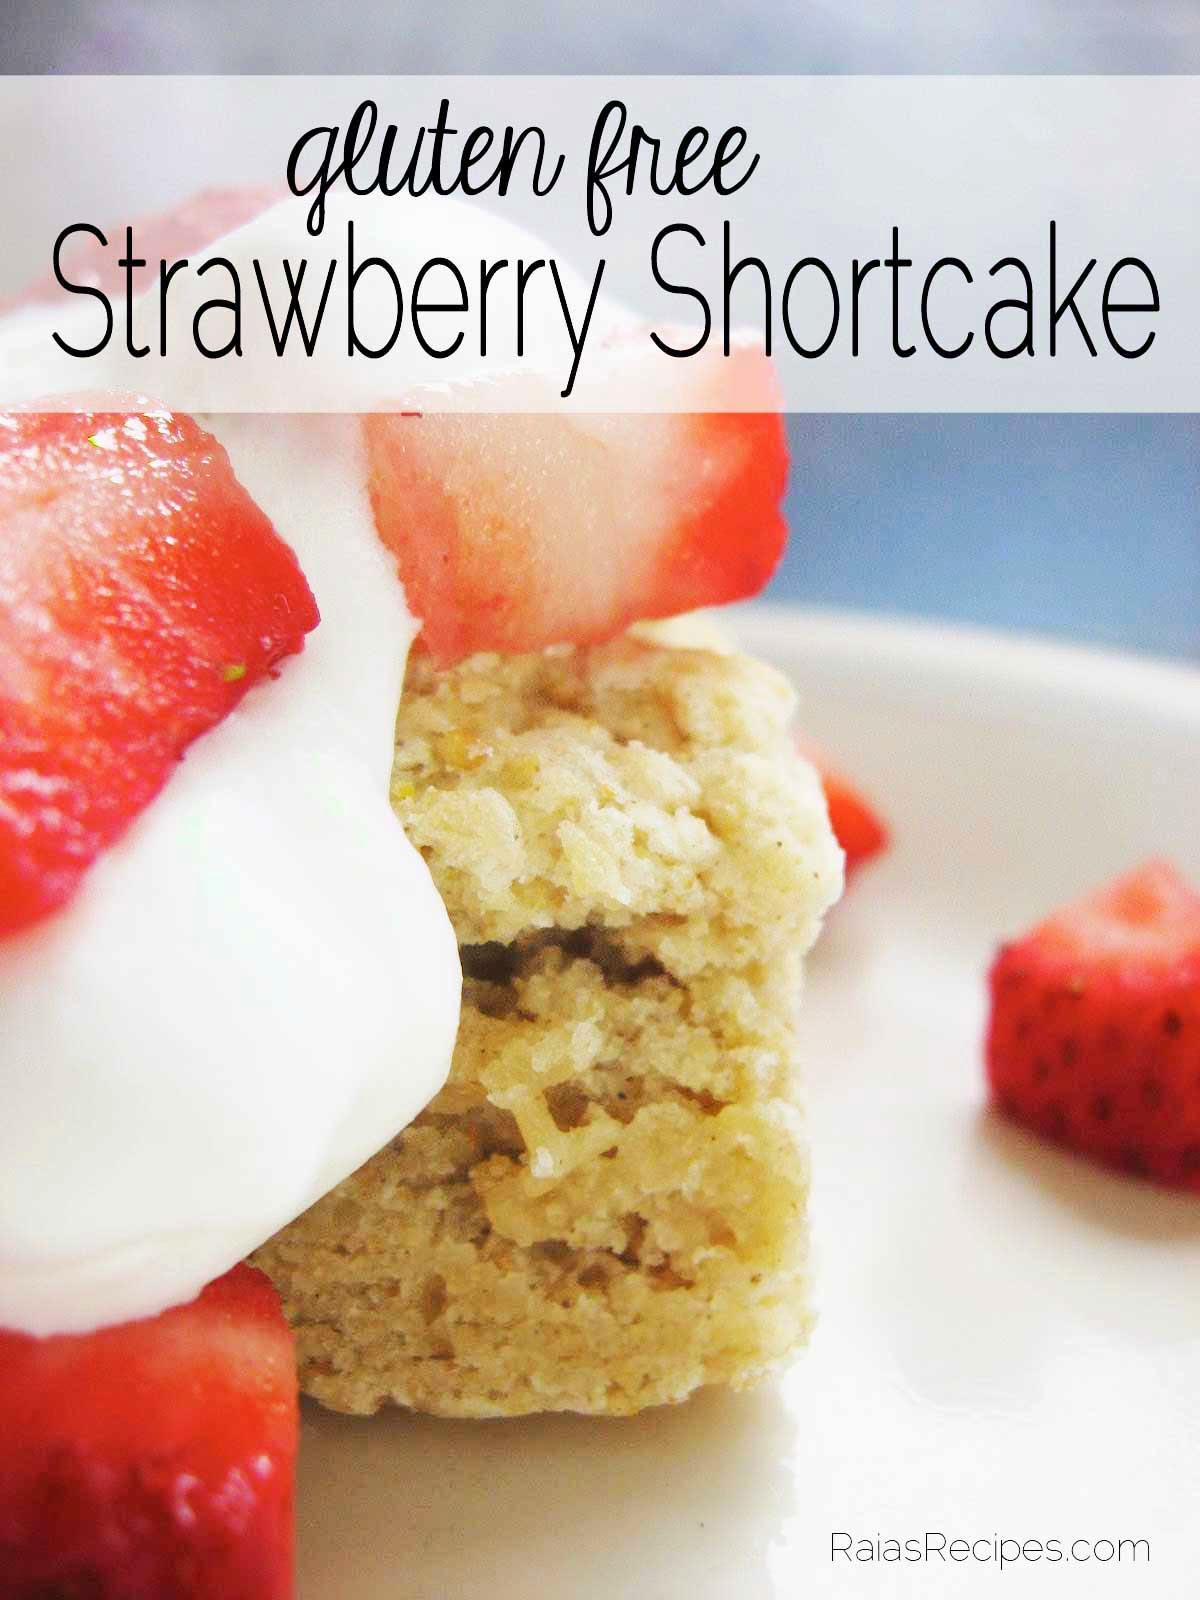 Gluten Free Strawberry Shortcake by RaiasRecipes.com